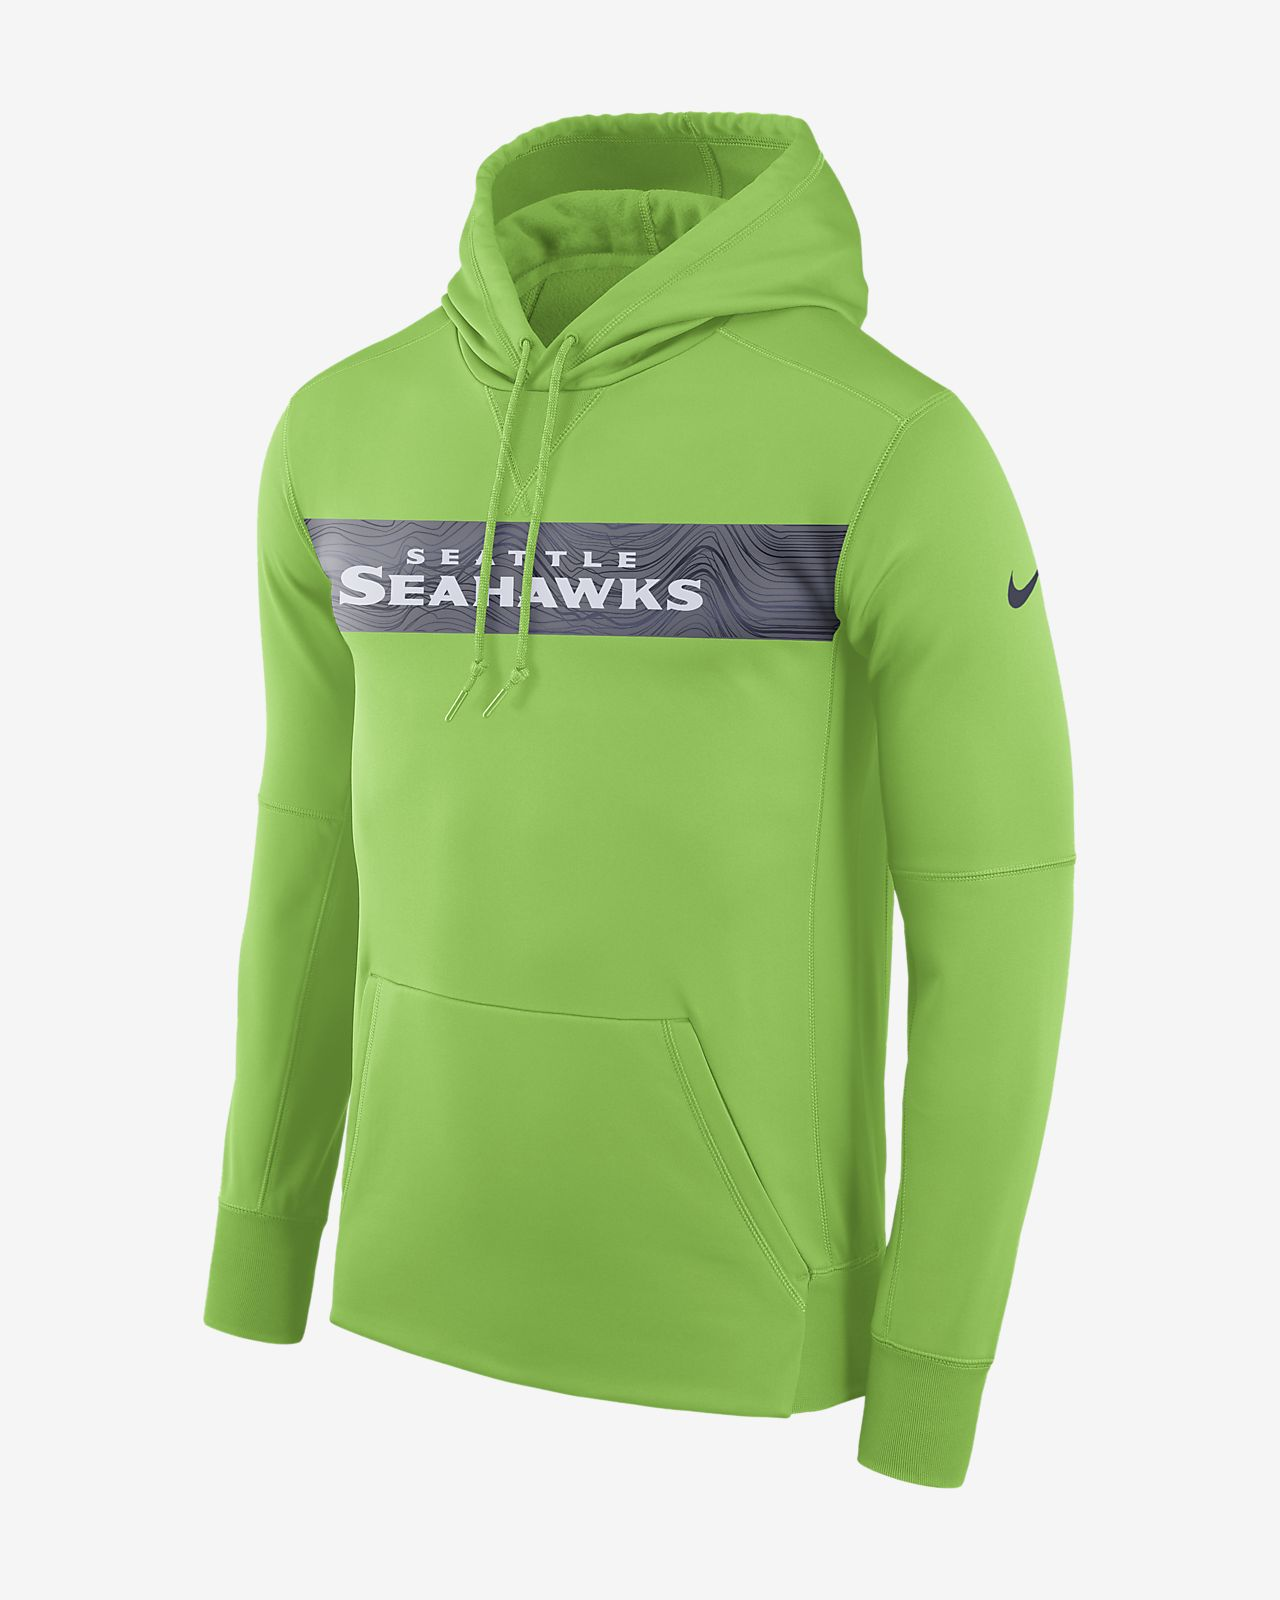 0aa15b295b90 Nike Dri-FIT Therma (NFL Seahawks) Pullover-Hoodie für Herren